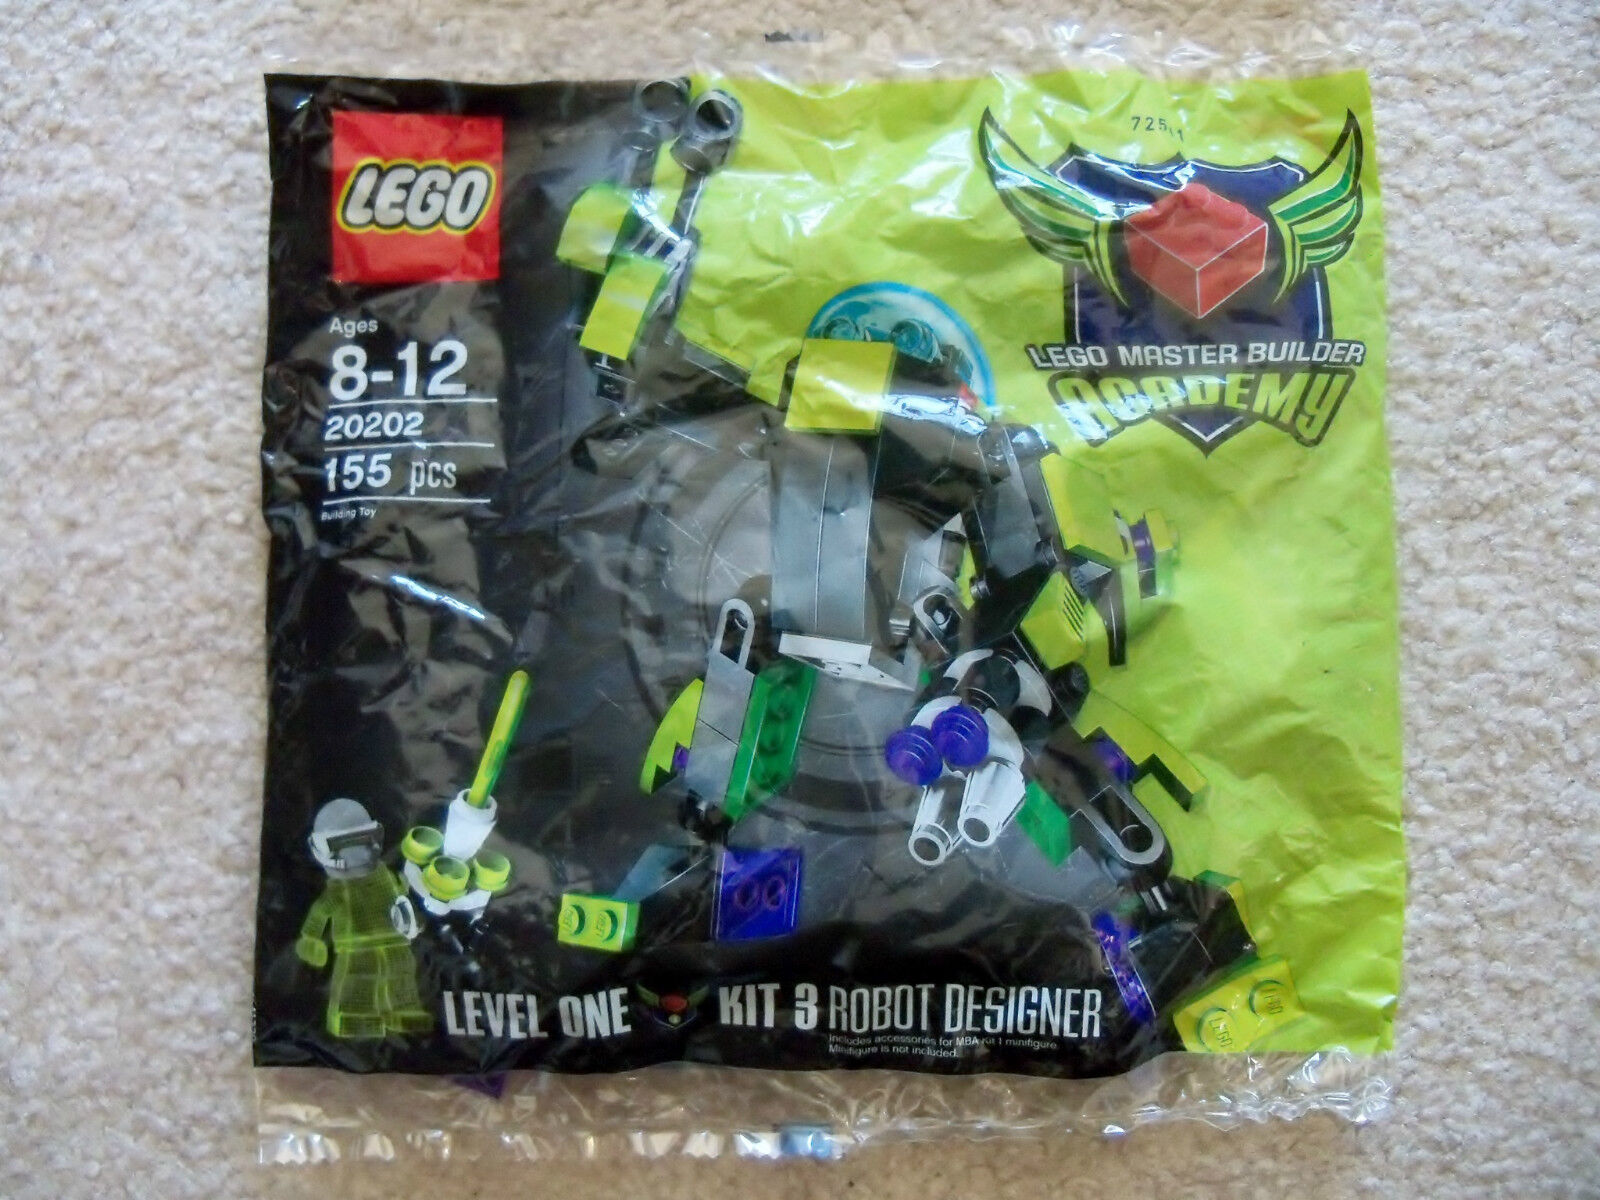 LEGO - MBA Master Builder Academy Level 1 20202 - Robot Designer - New Sealed